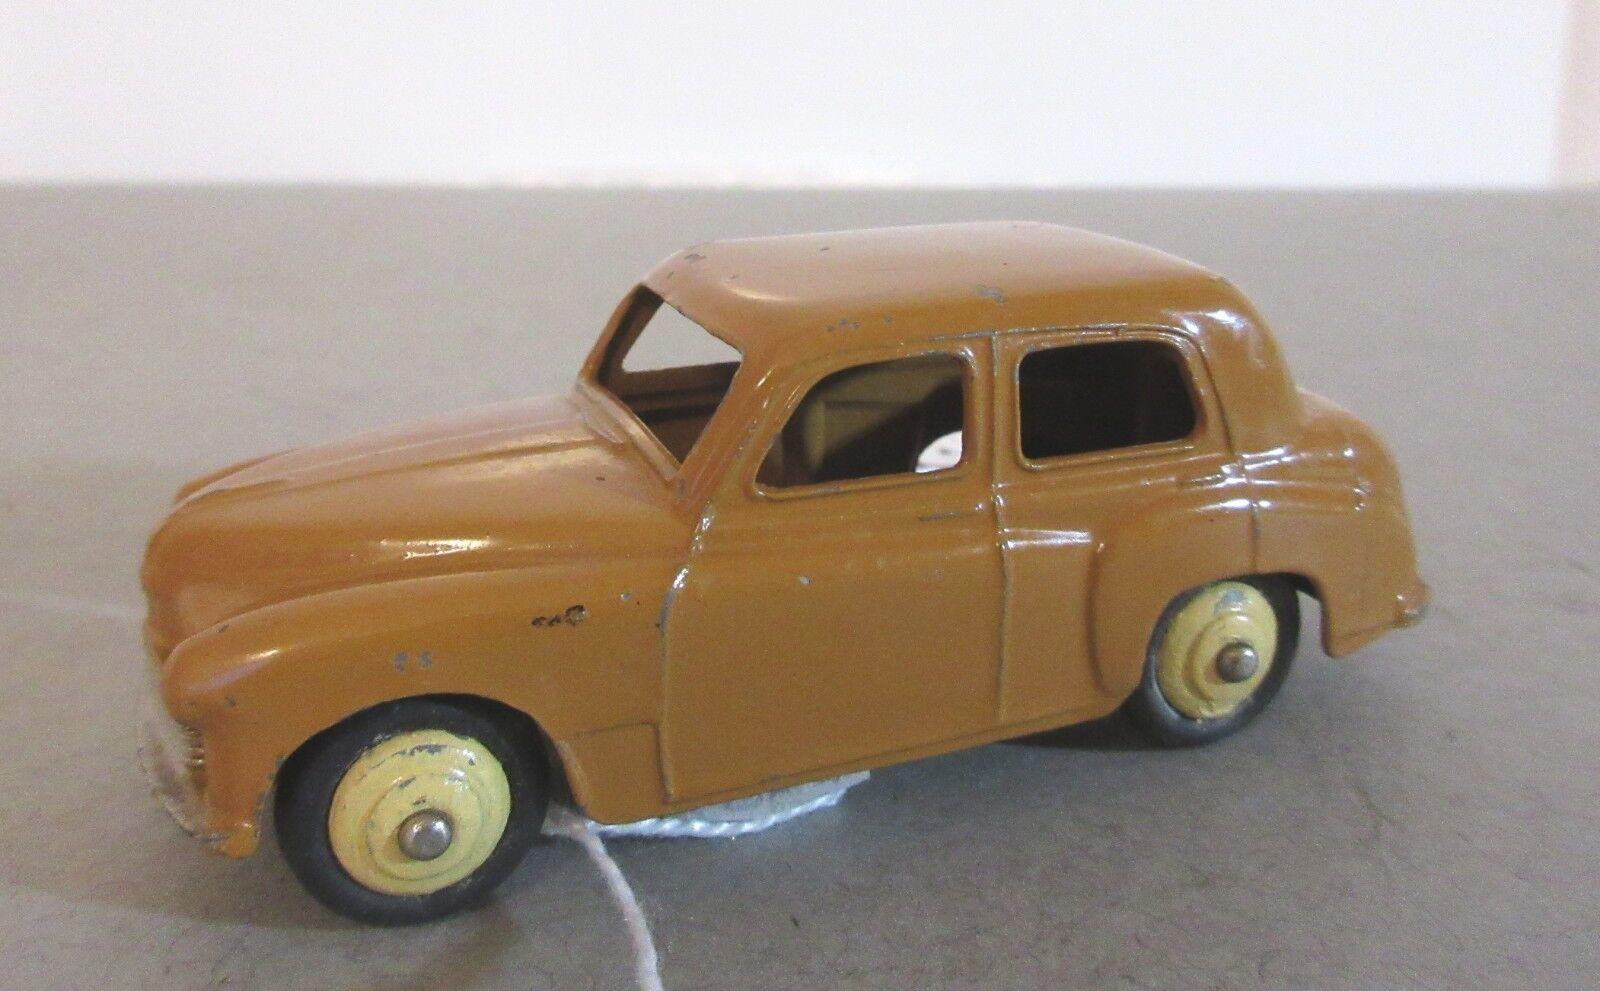 minorista de fitness Hillman Minx cuatro puertas Dinky Dinky Dinky Juguetes Familia Saloon Coche-década de 1950 coches dinky Juguetes  para mayoristas